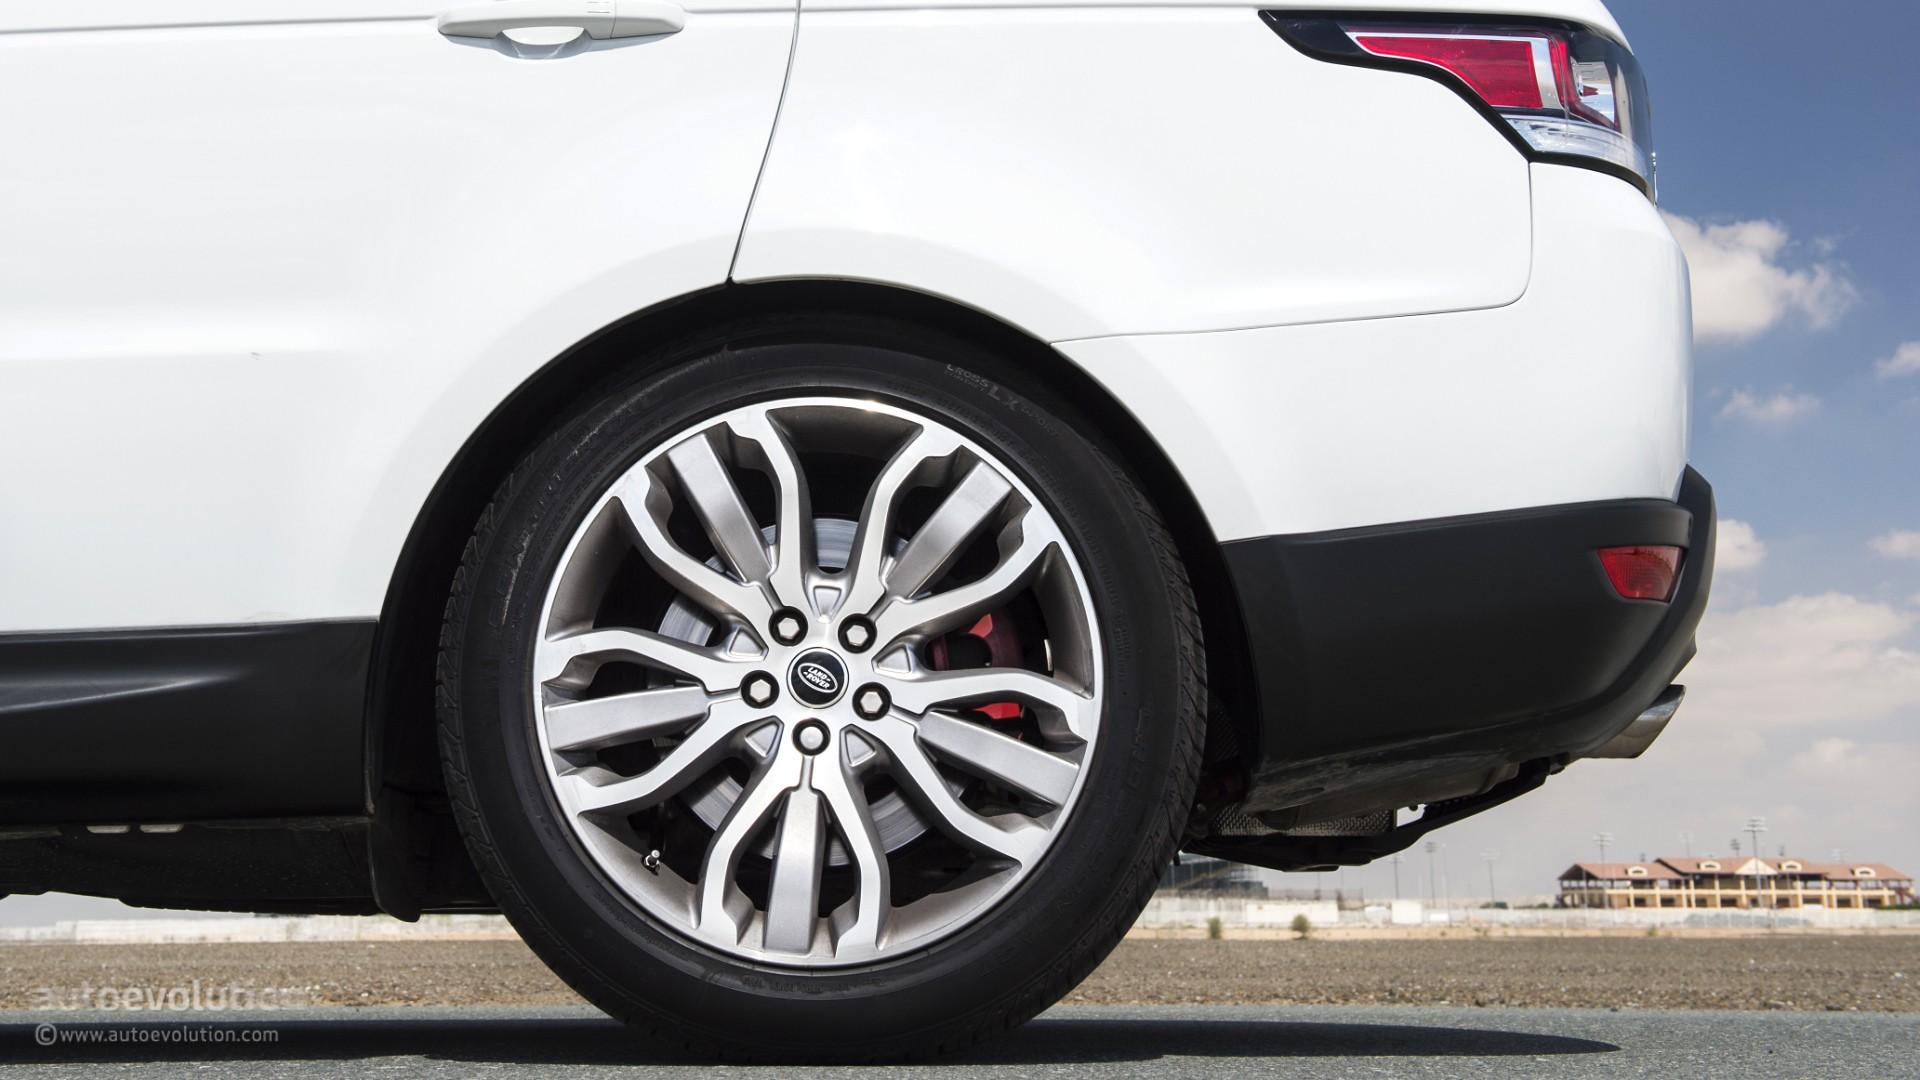 Range Rover Wheels 2015 2015 Range Rover